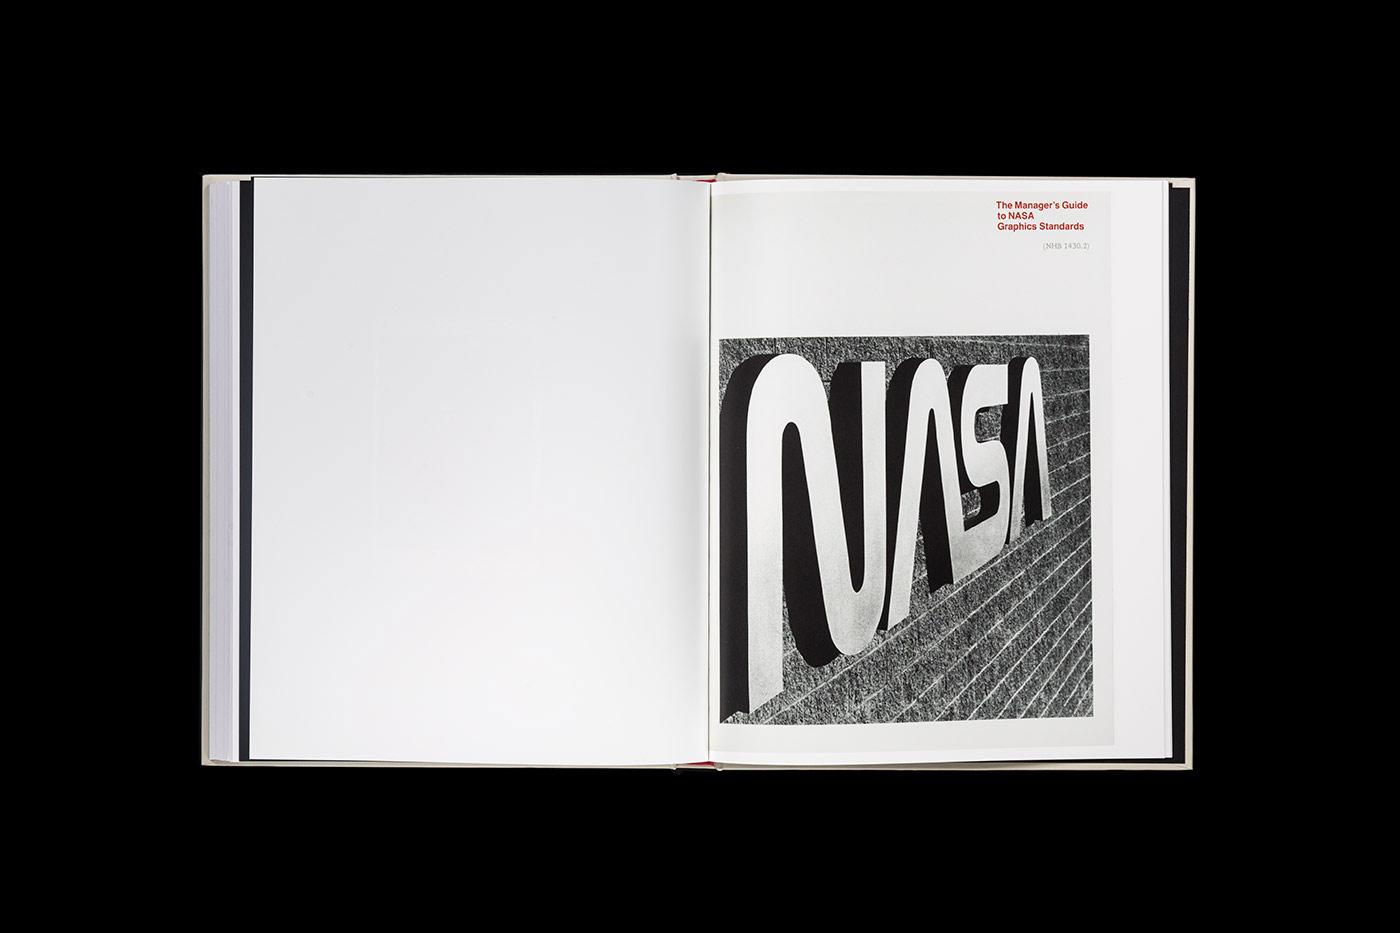 nasa-graphics-standards12